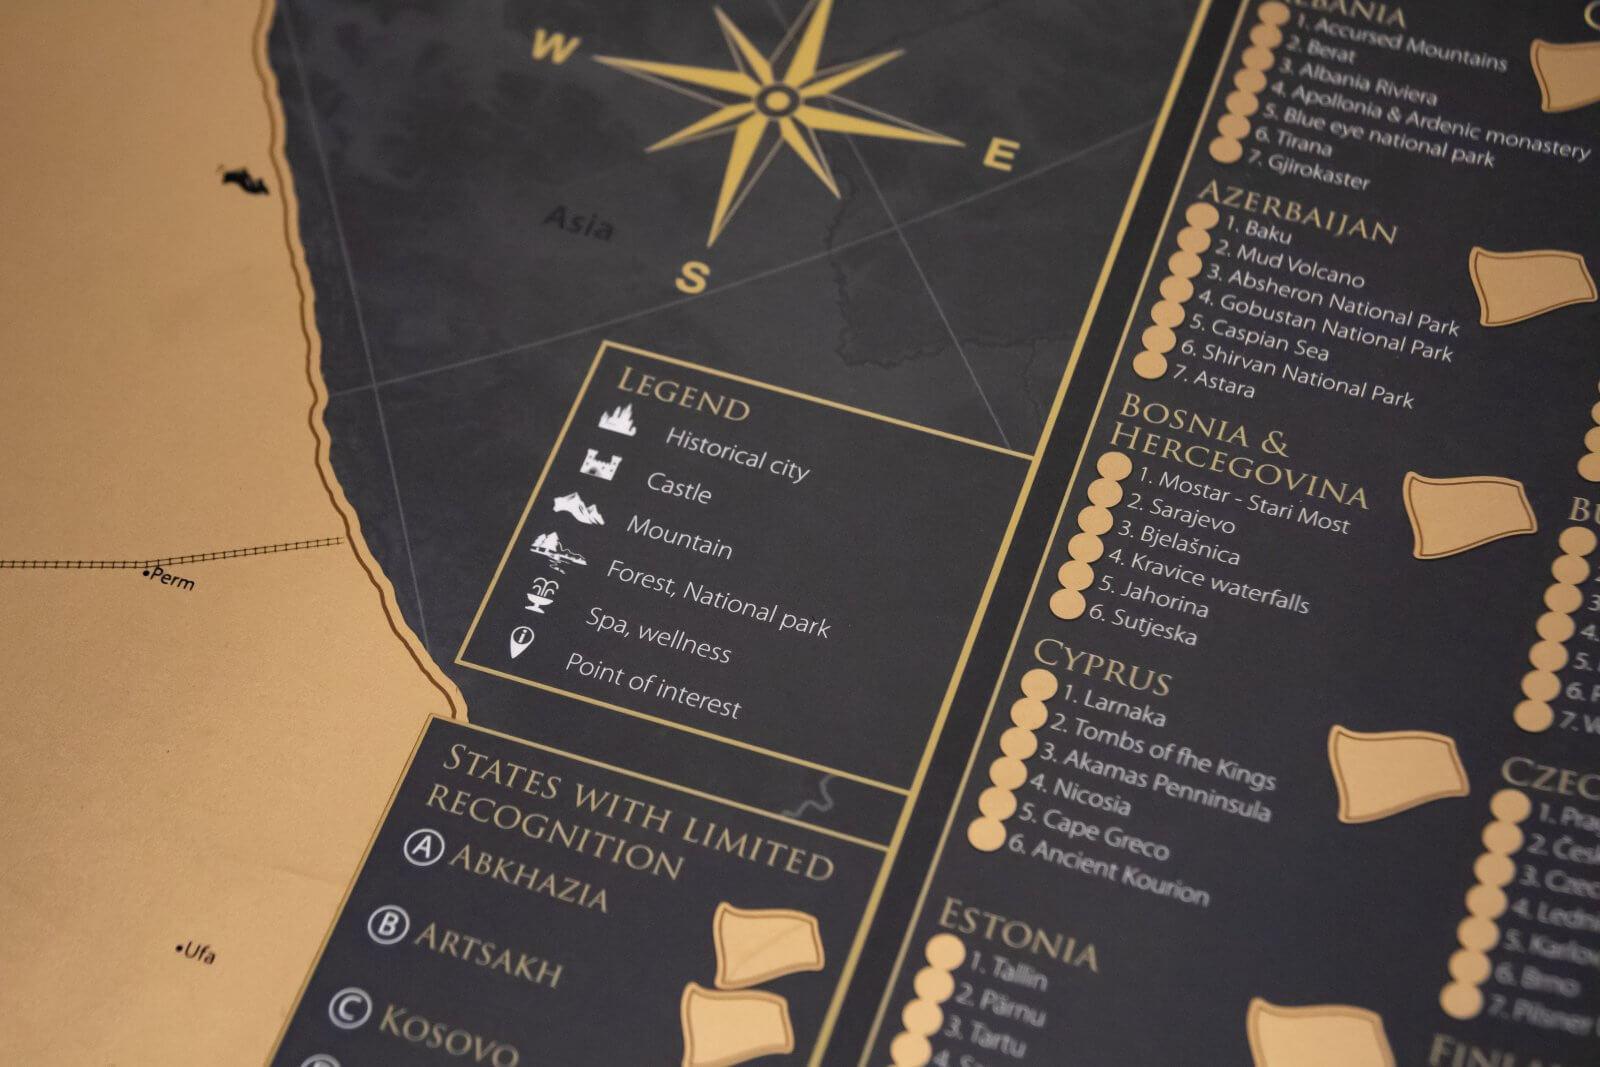 Stieracia mapa Európy - Detail legendy